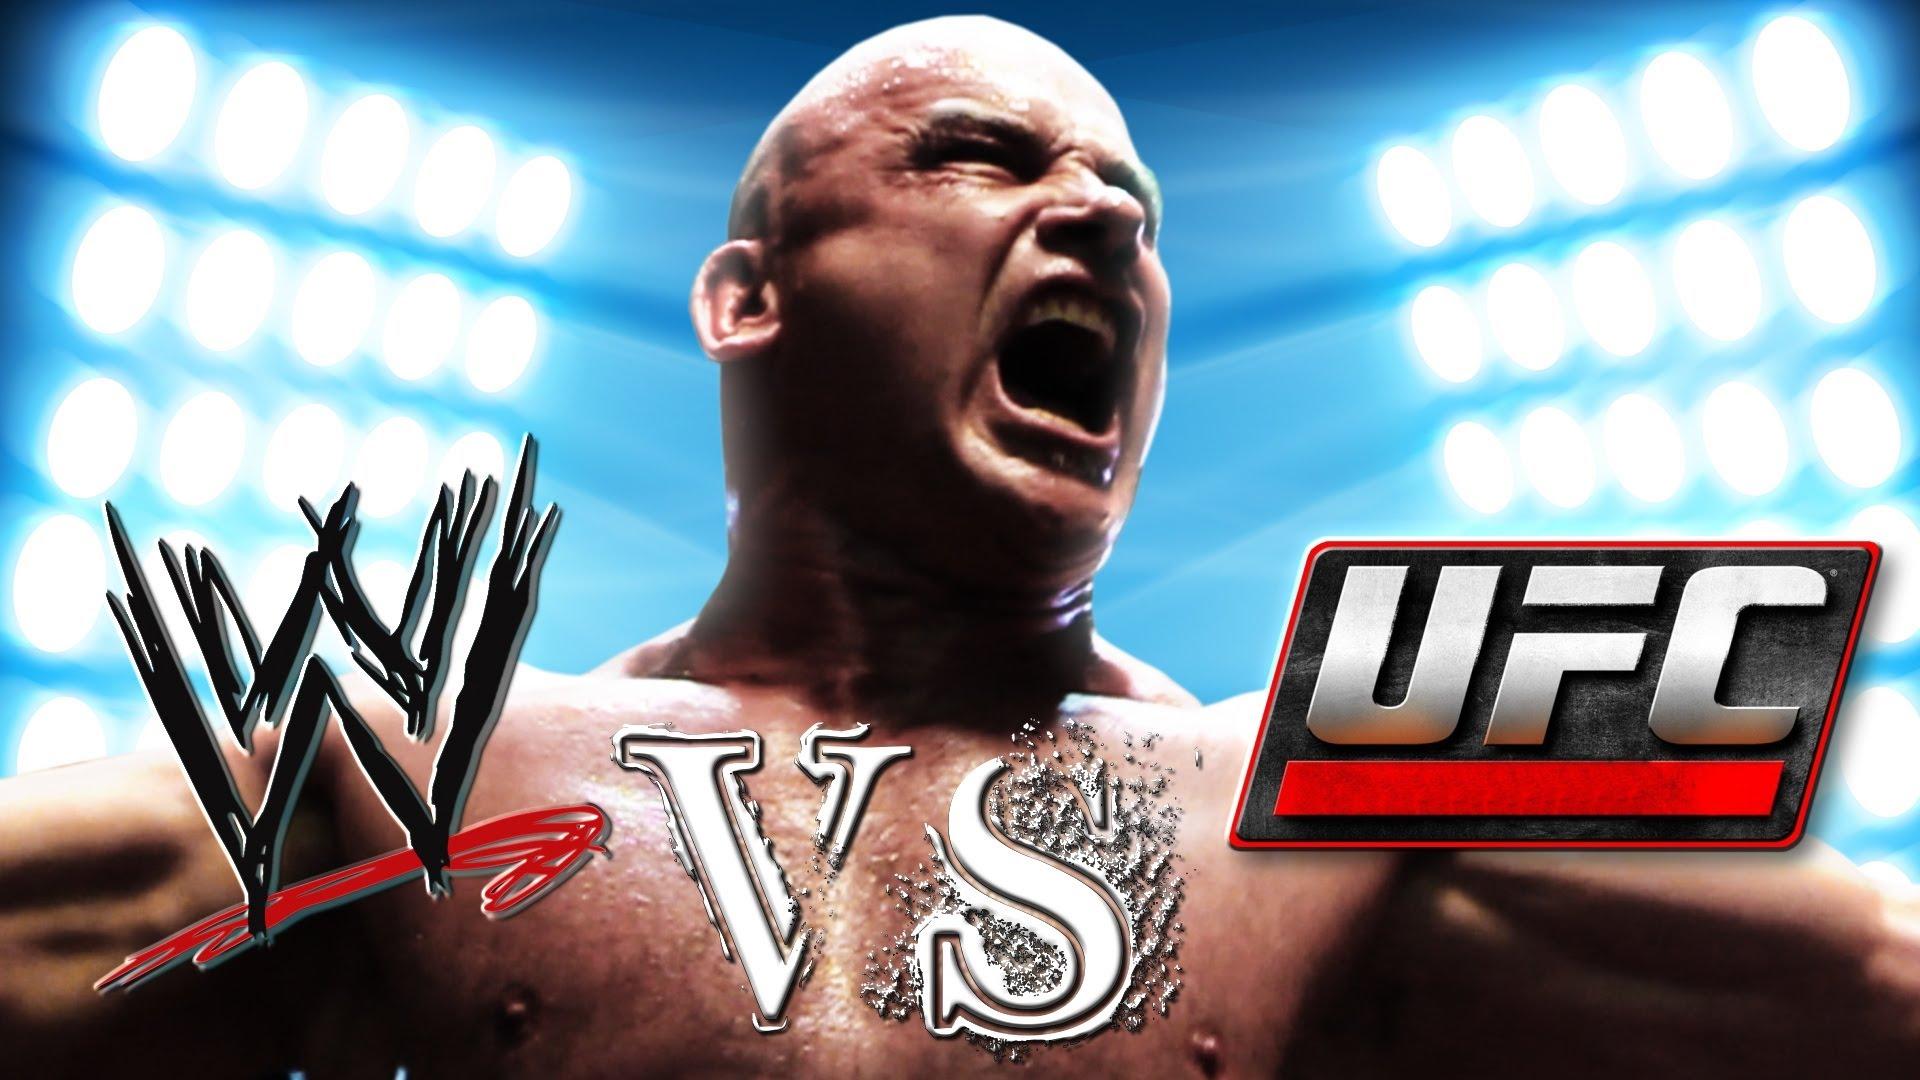 UFC vs. WWE